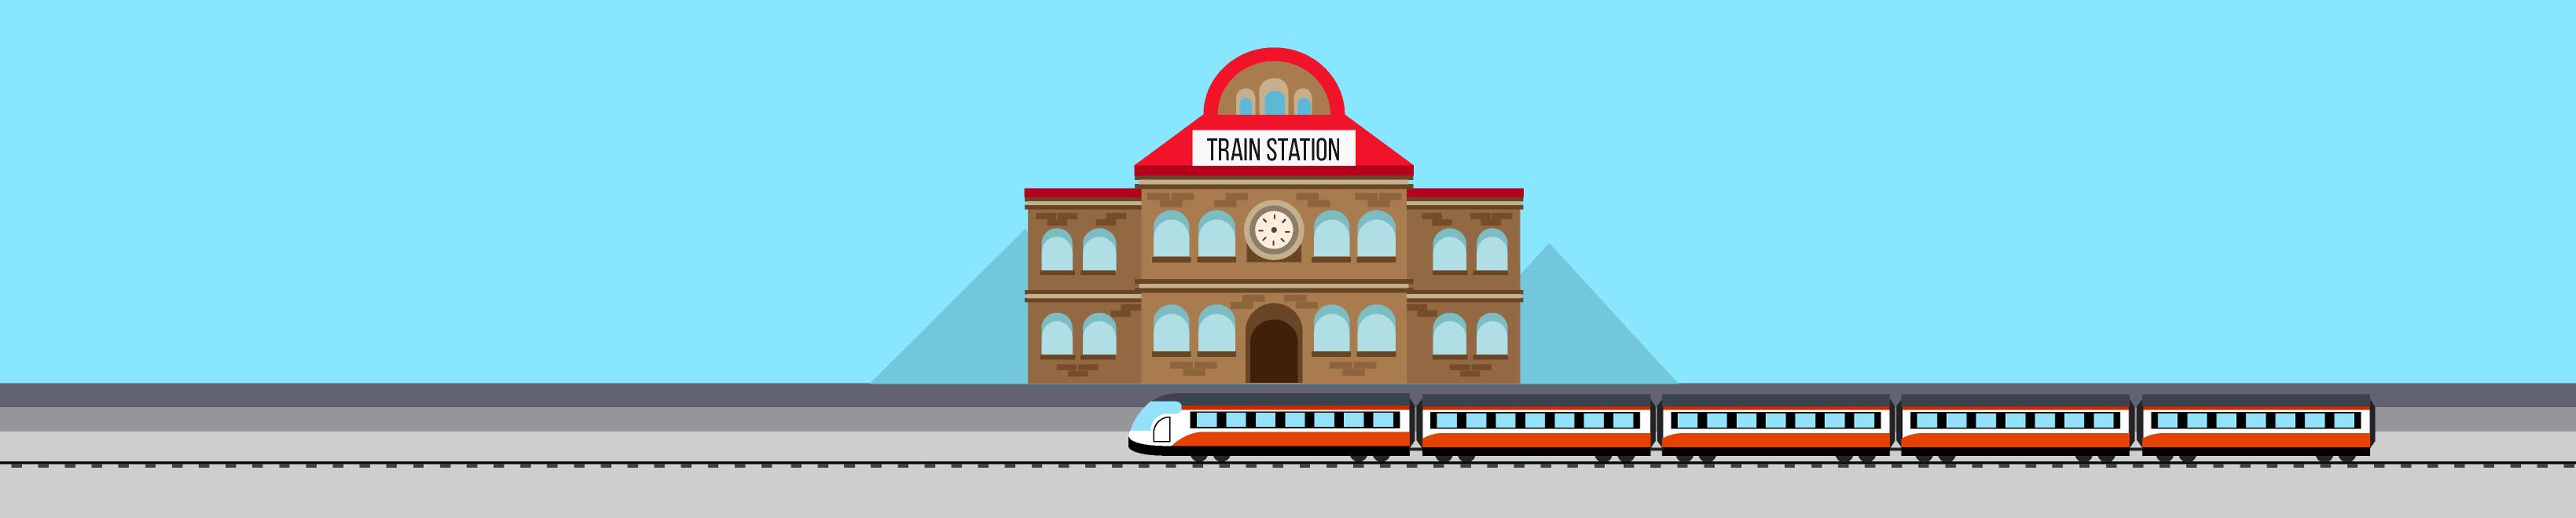 railway worker's pension